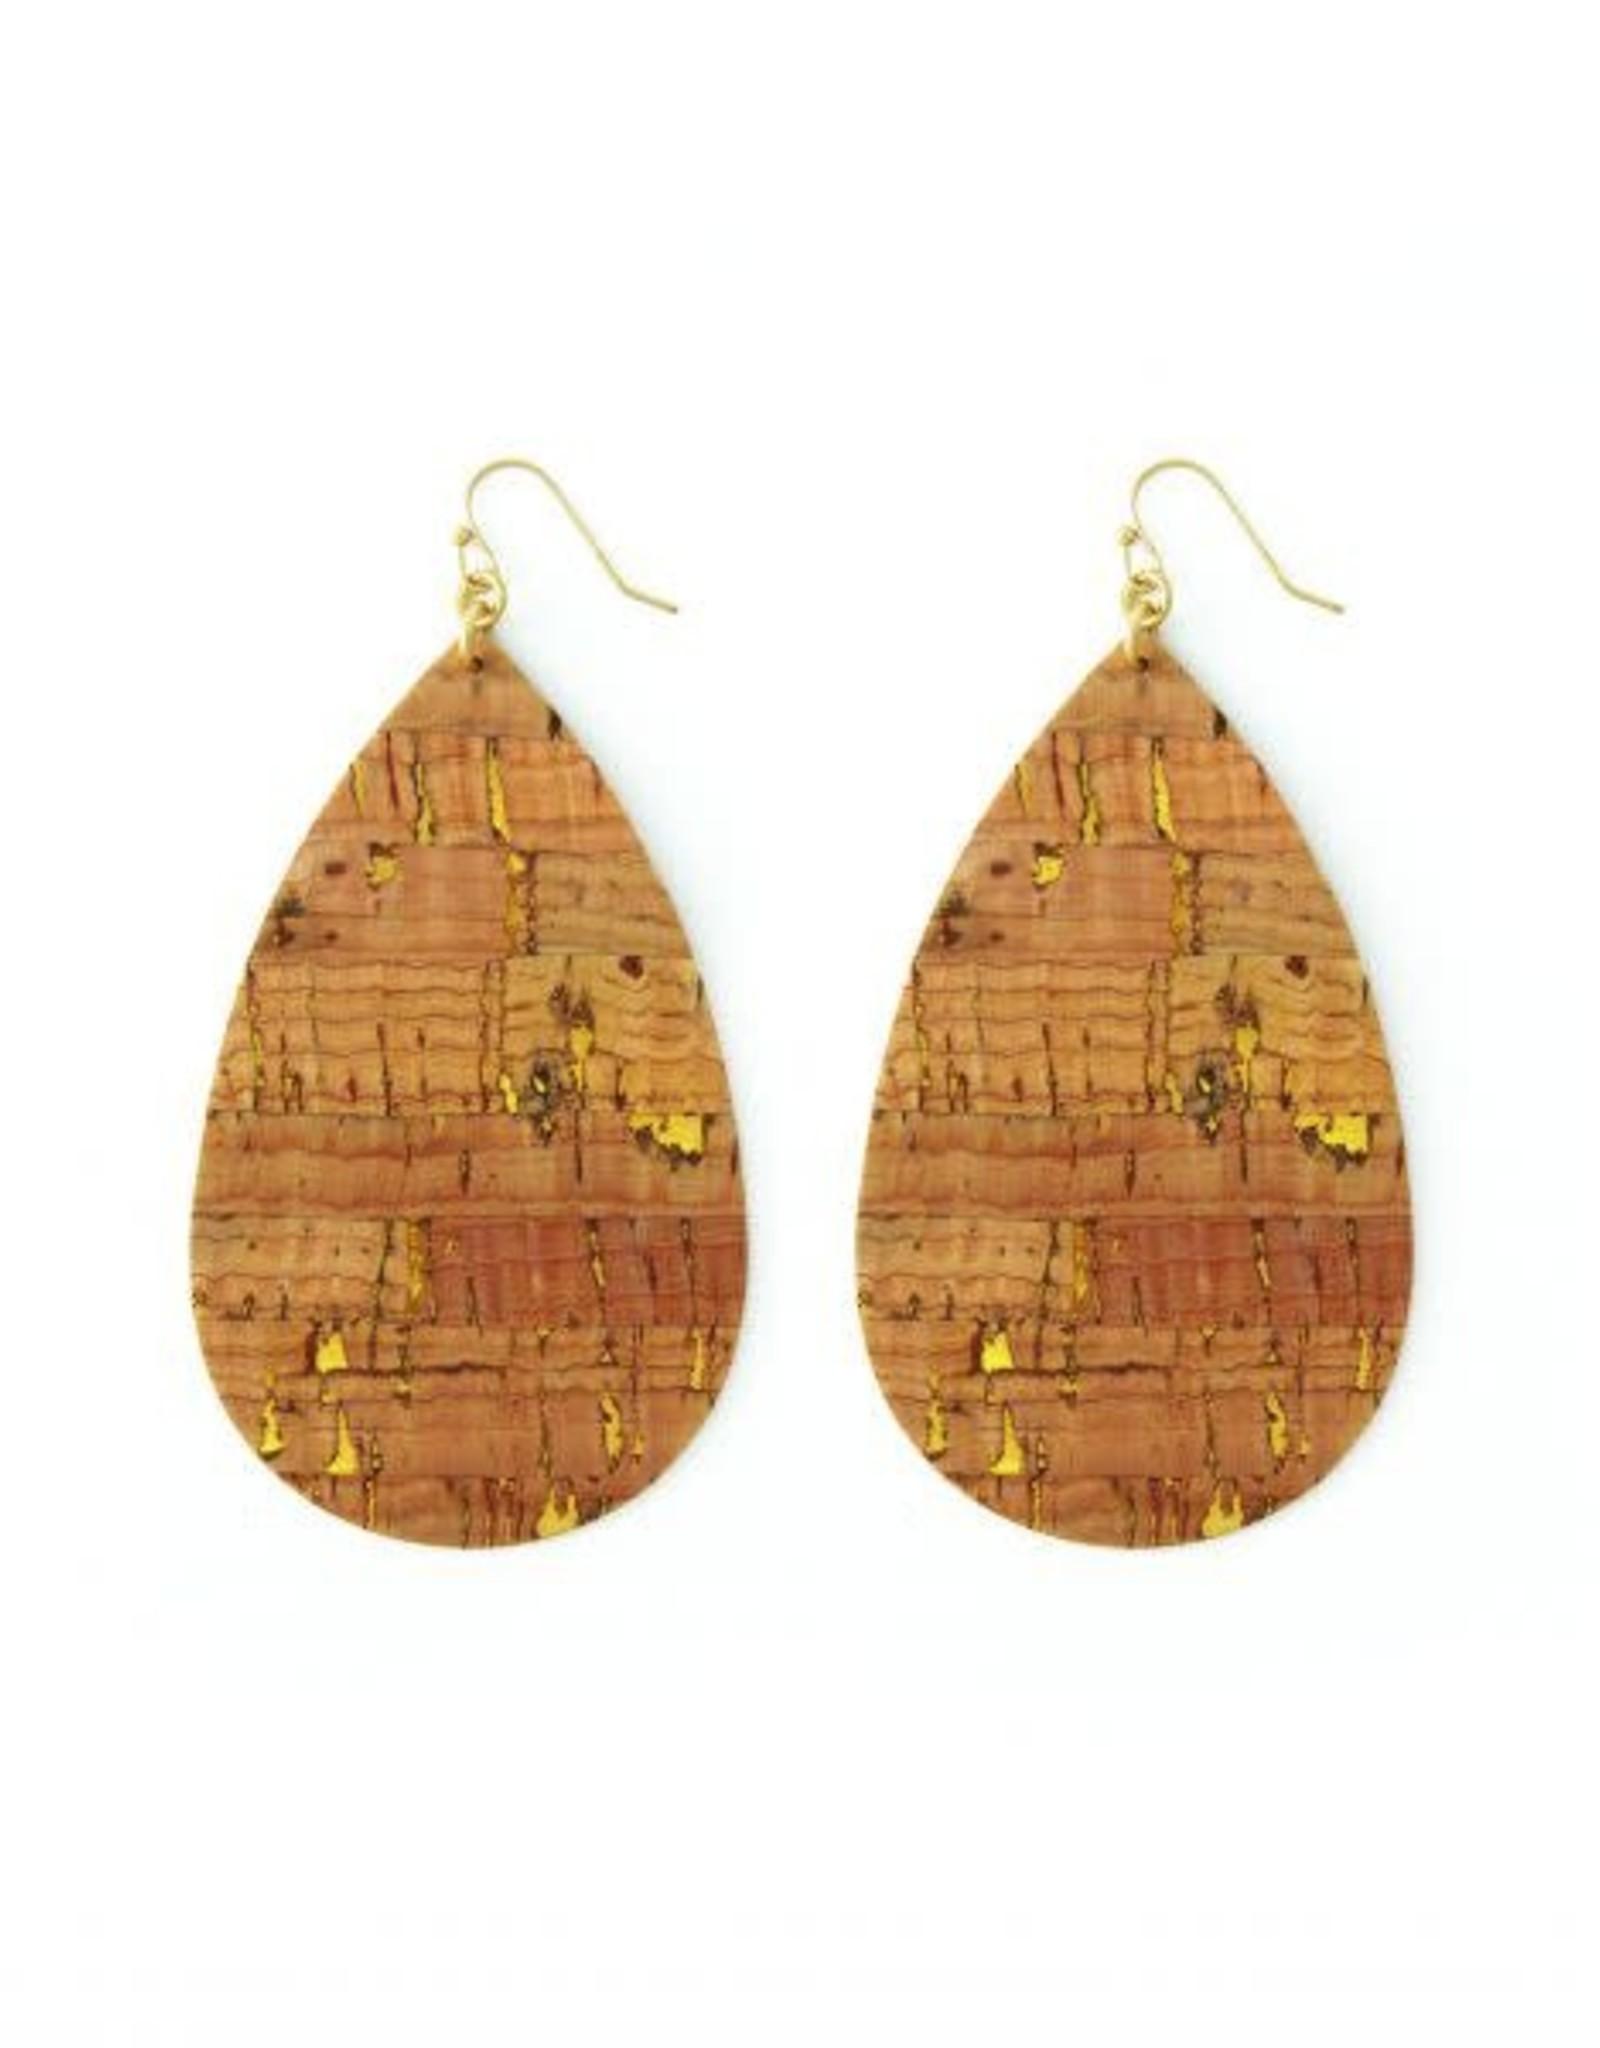 Splendid Iris E – Large gold accented cork teardrop